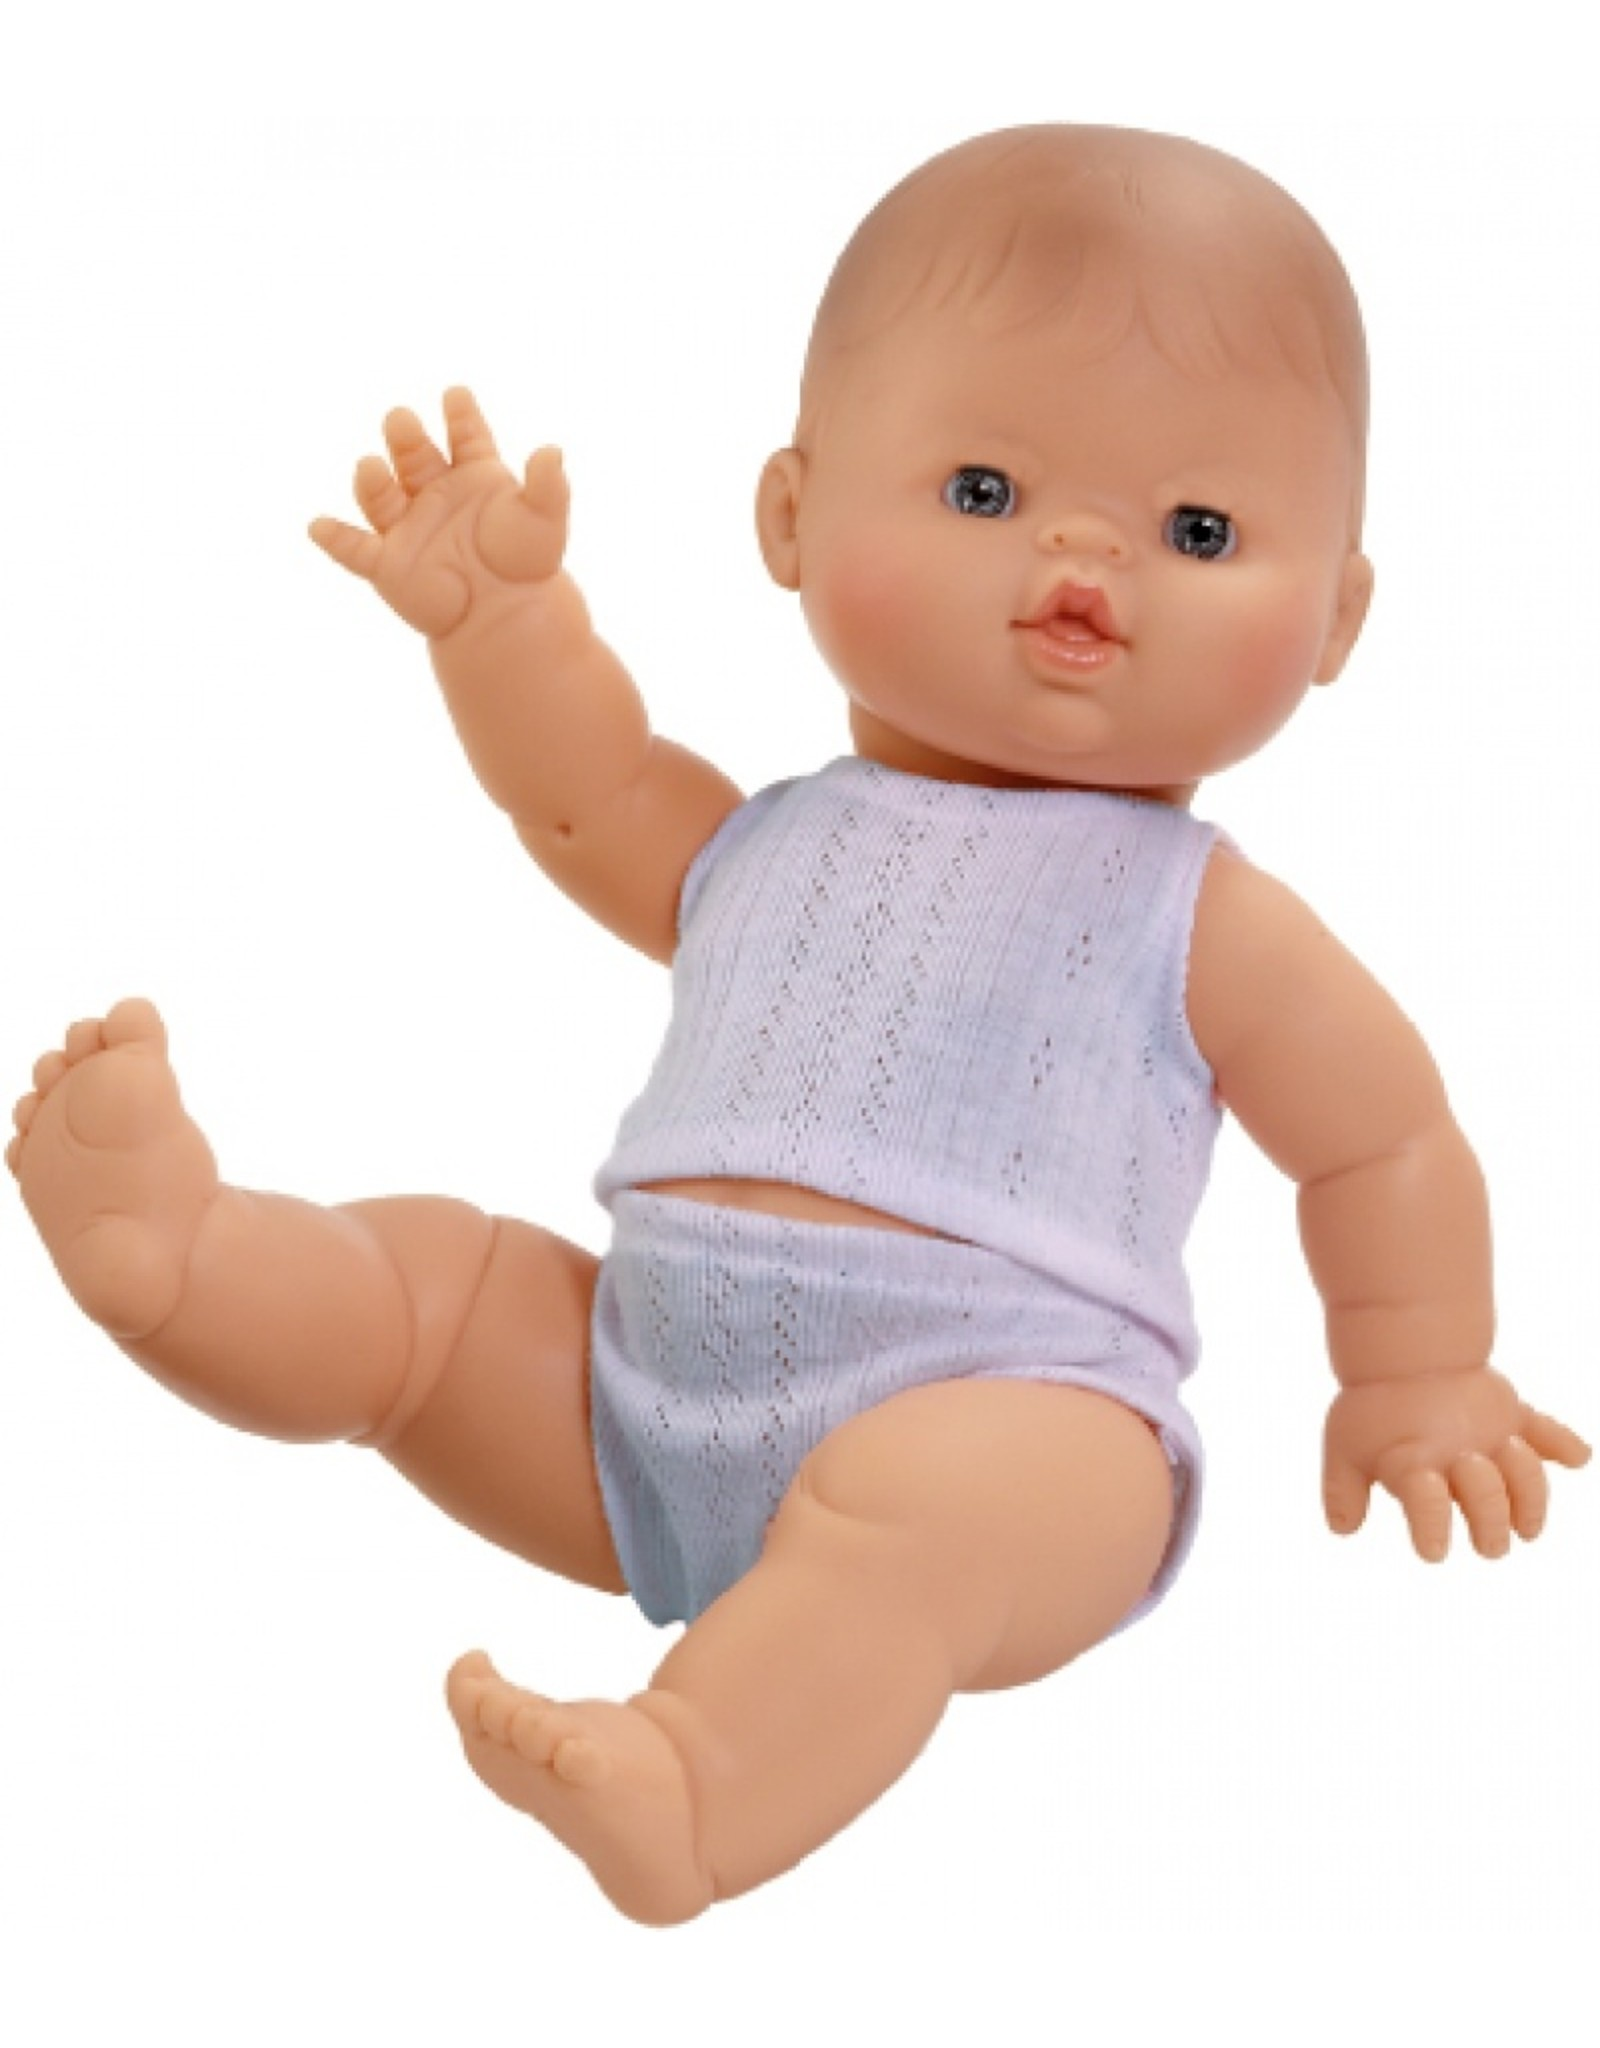 Poala Reina Pop - Gordi jongen (blank), ondergoed 34cm